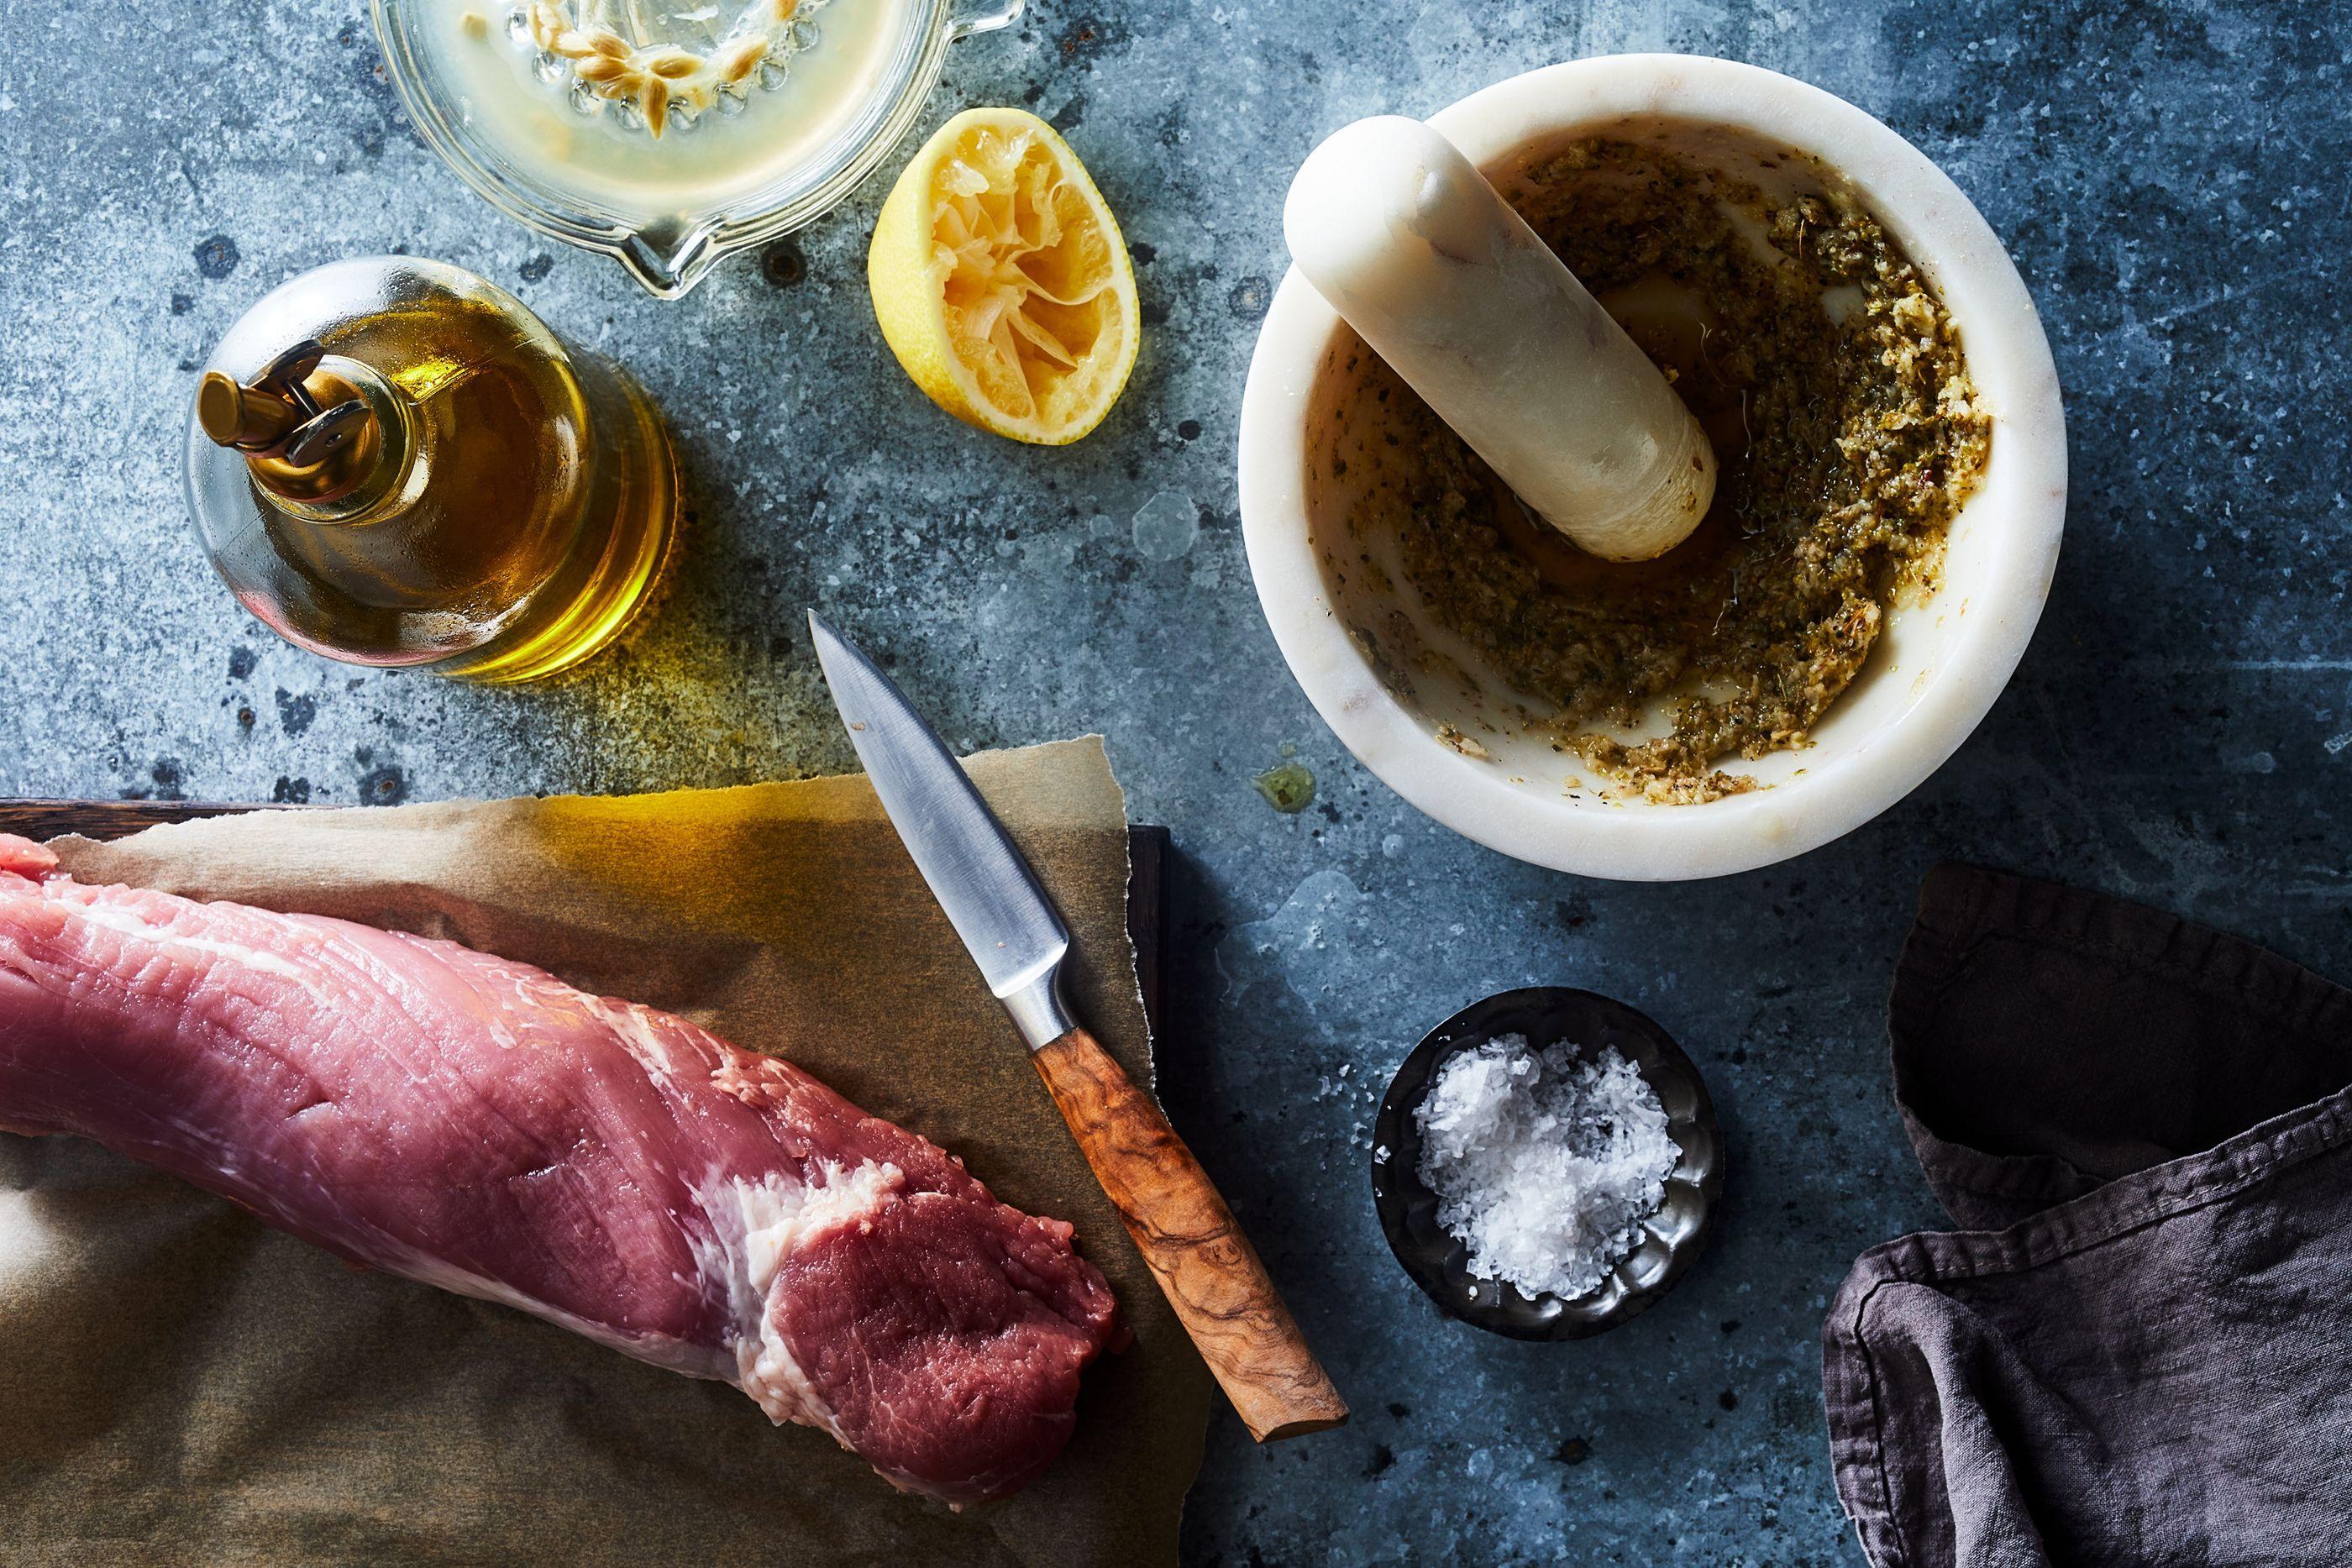 The Genius Secrets to Never-Boring, Never-Dry Pork Tenderloin